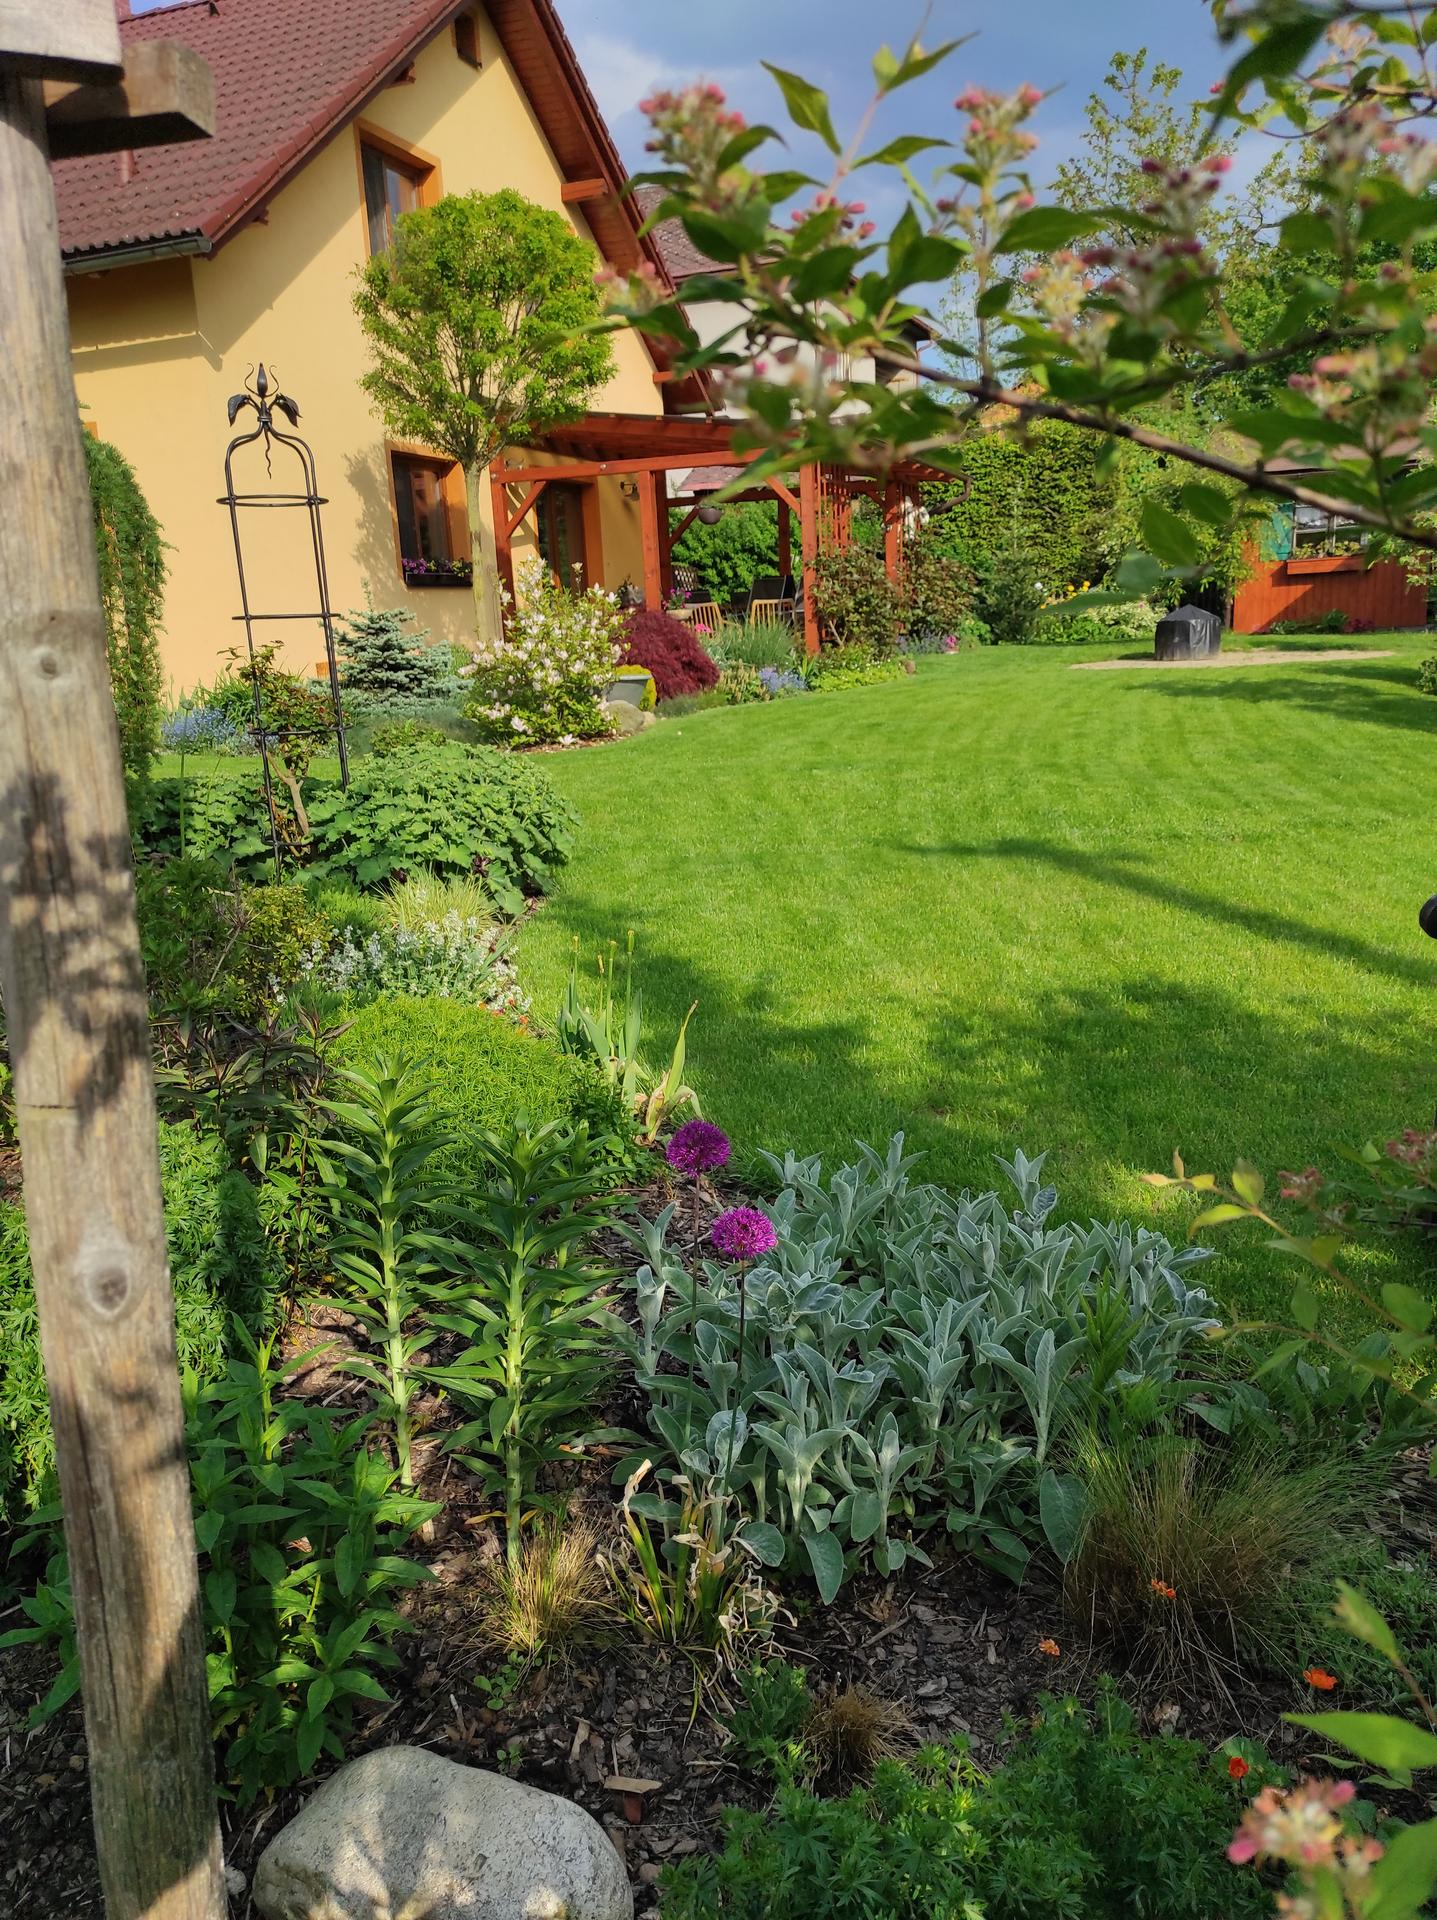 Zahrada 2021 - Obrázek č. 39